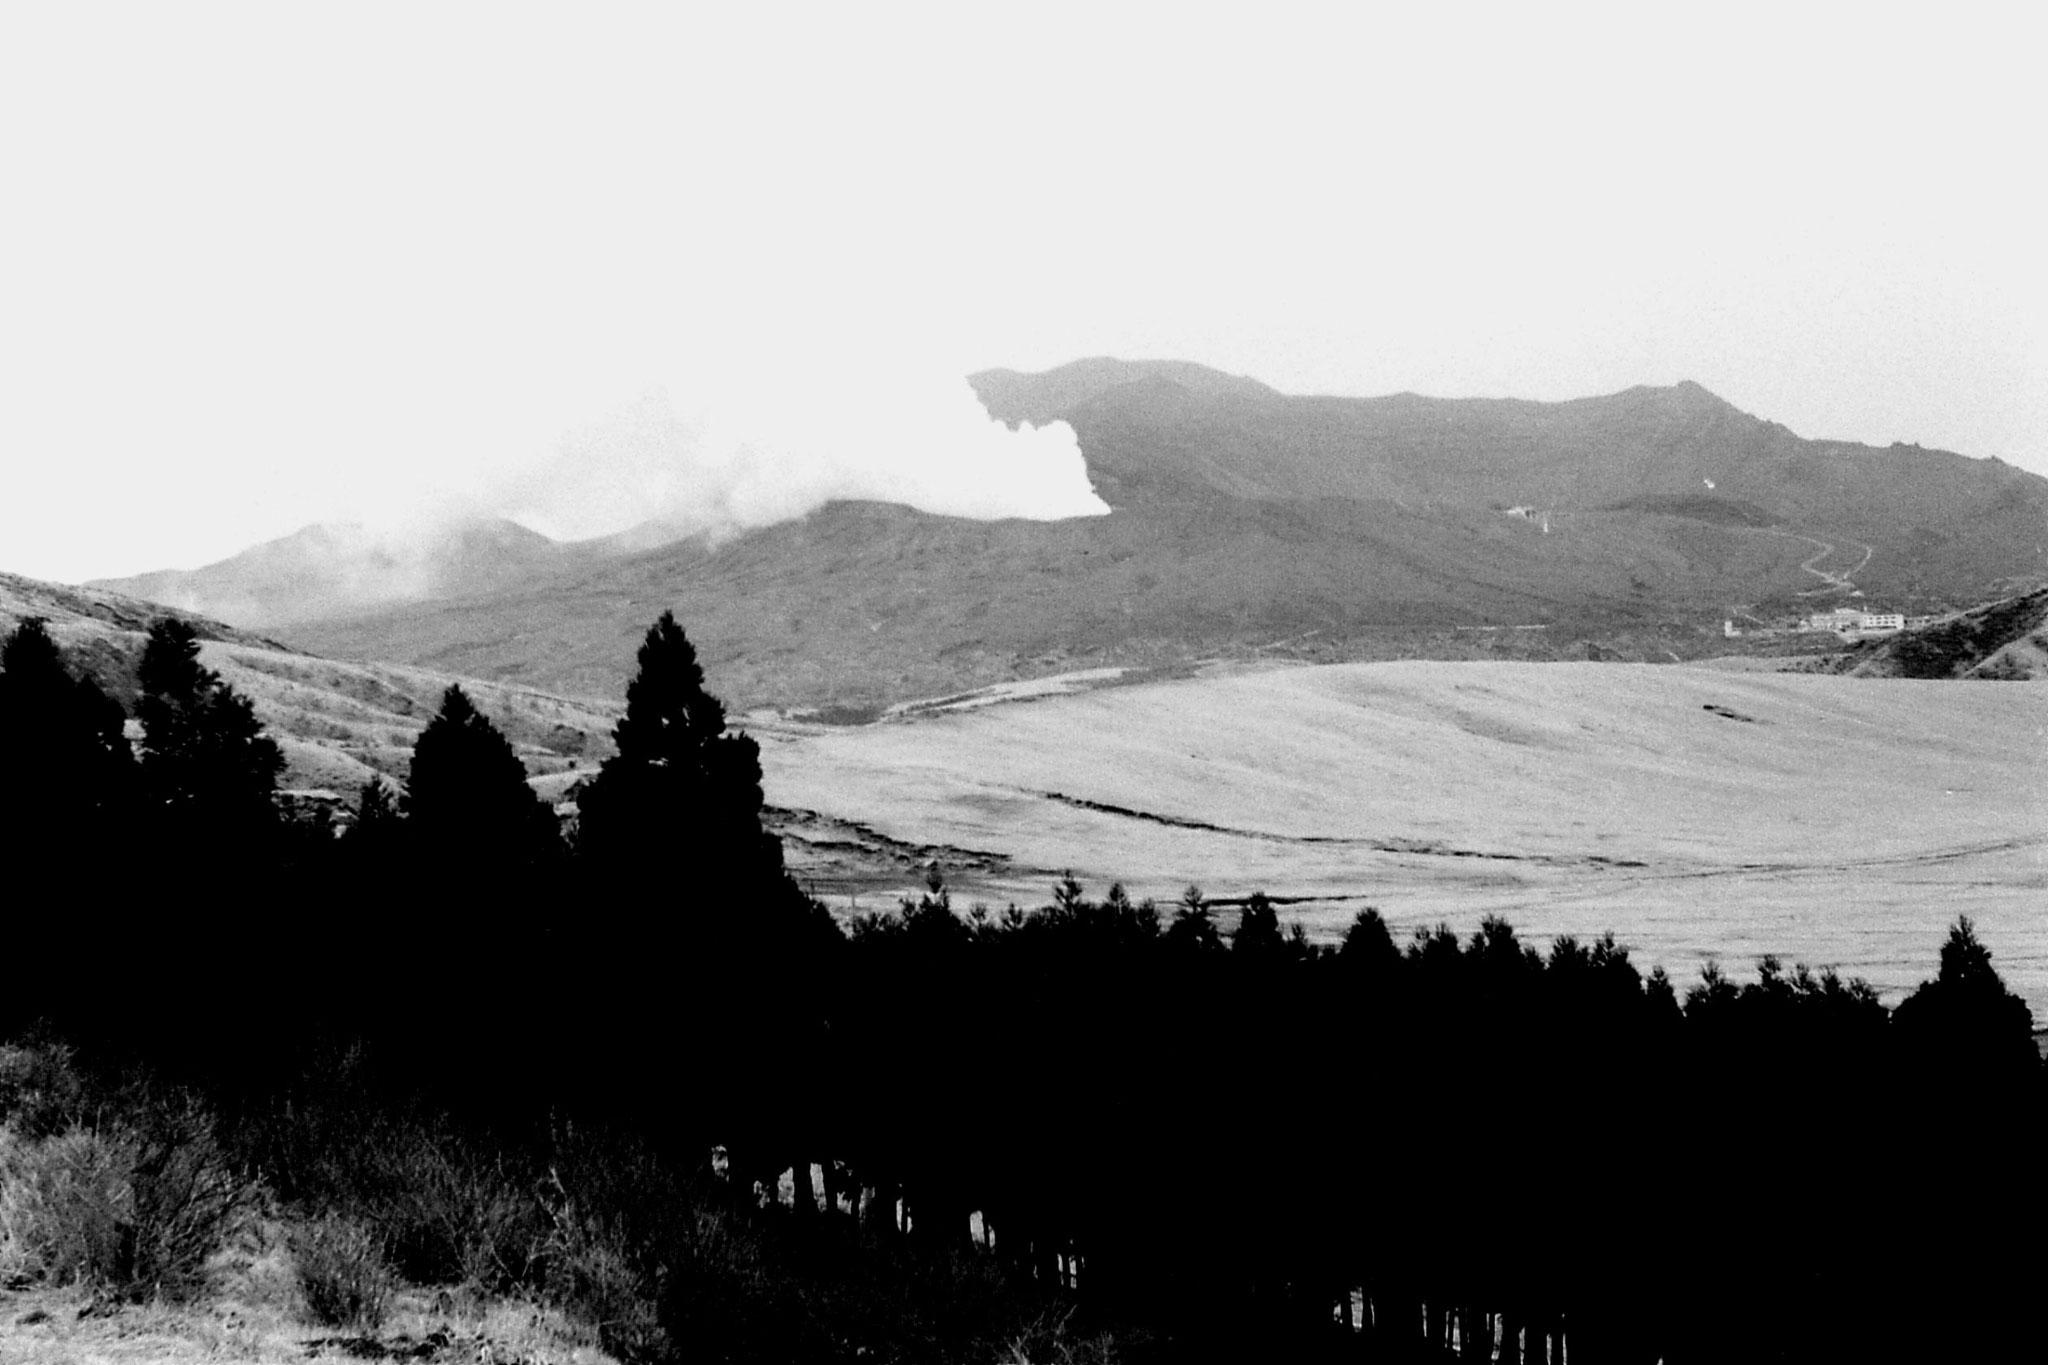 22/1/1989: 10: Aso volcano